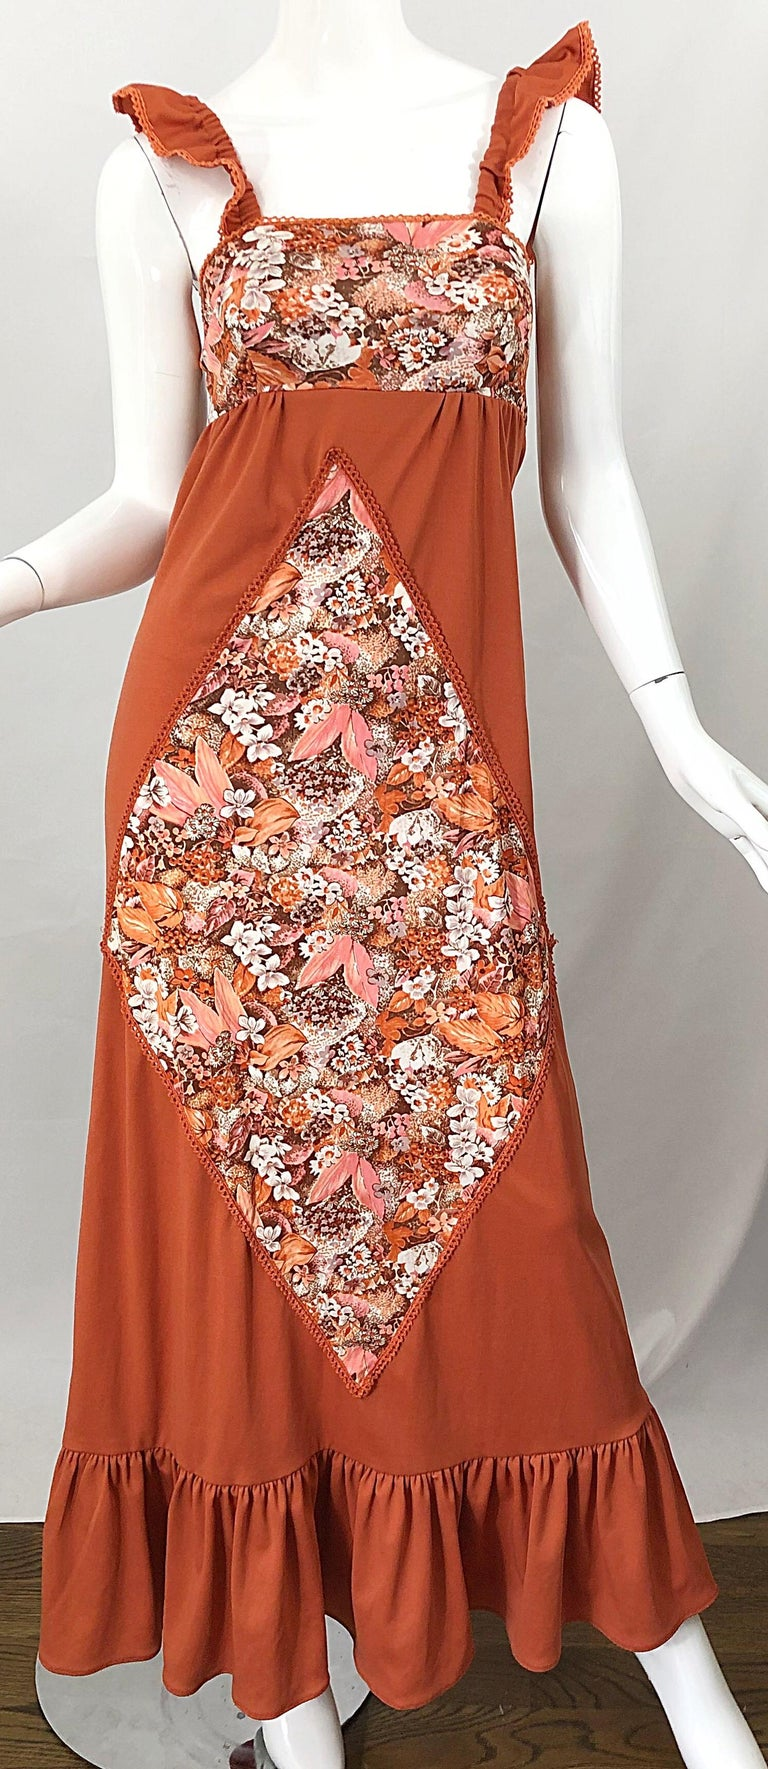 1970s Burnt Orange Patchwork Flowers Boho Vintage 70s Jersey Autumnal Maxi Dress For Sale 4